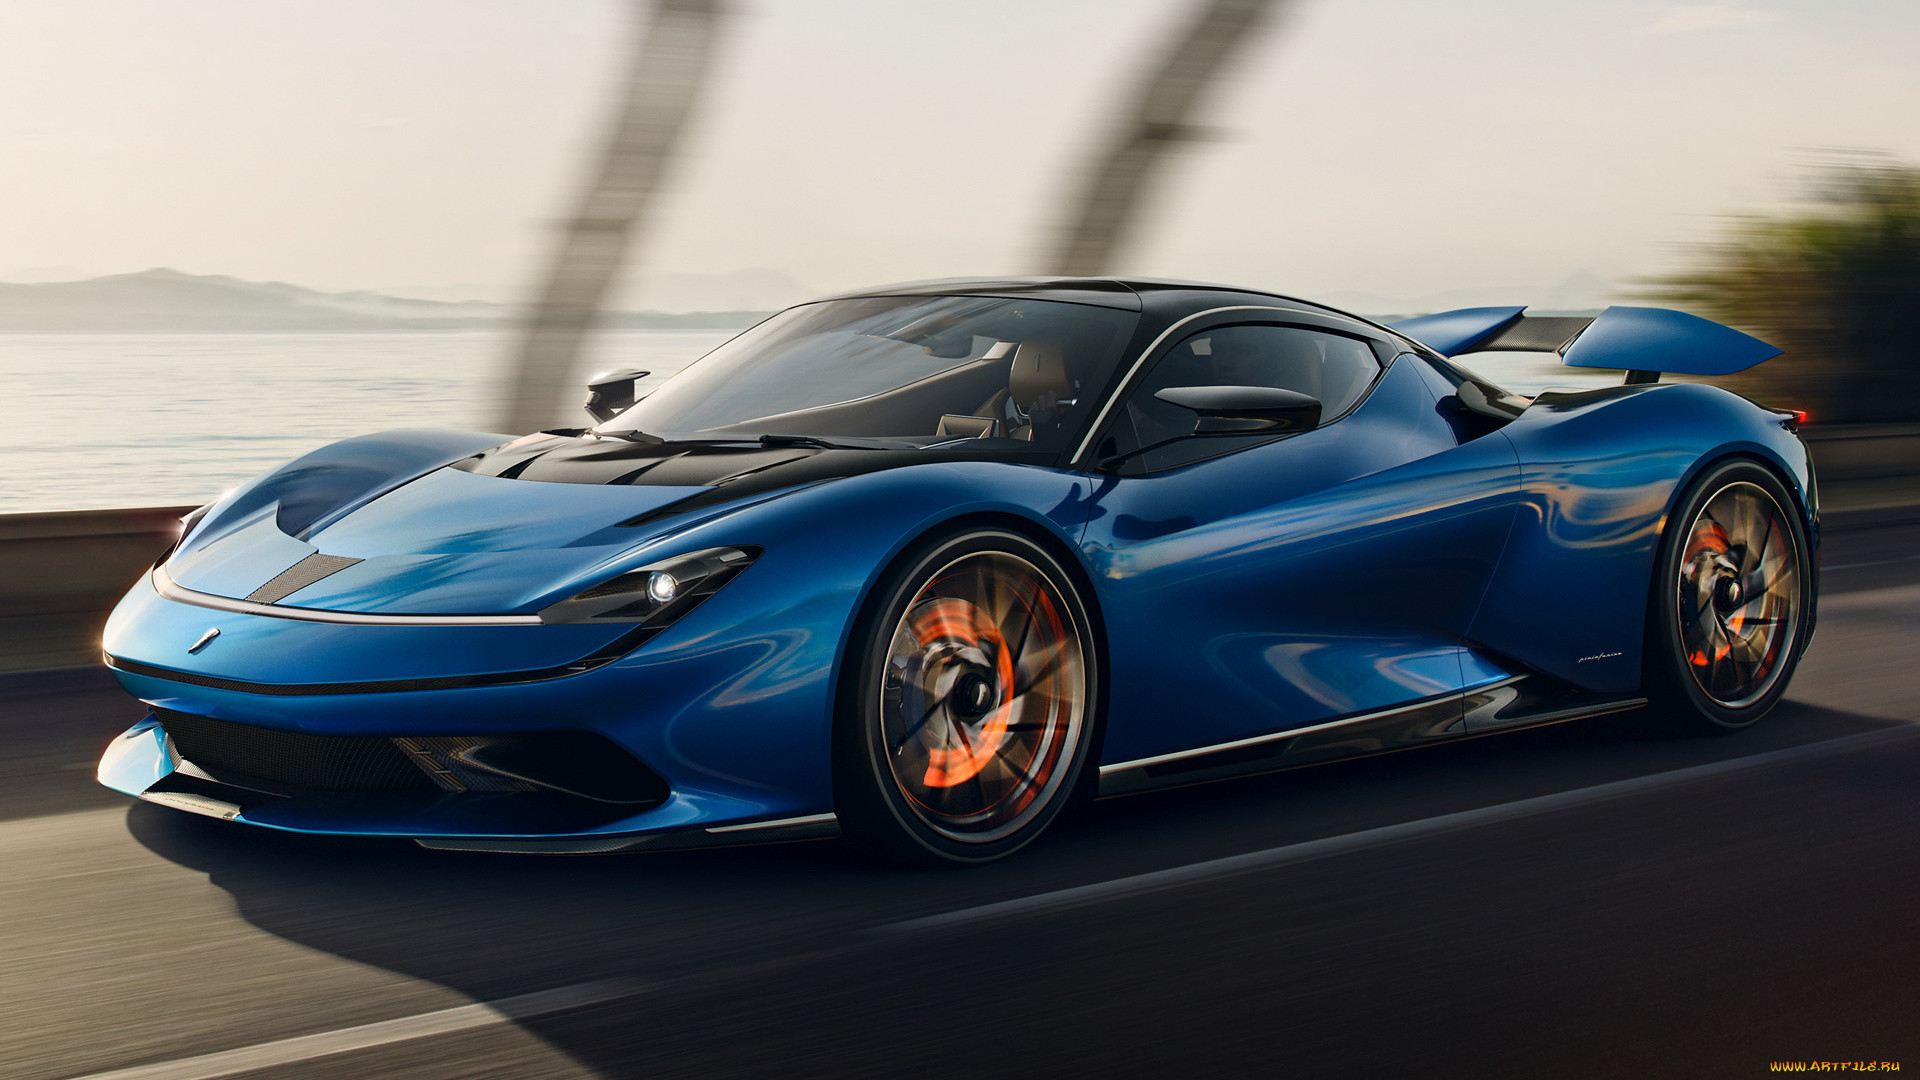 pininfarina battista iconica 2020, автомобили, pininfarina, battista, iconica, 2020